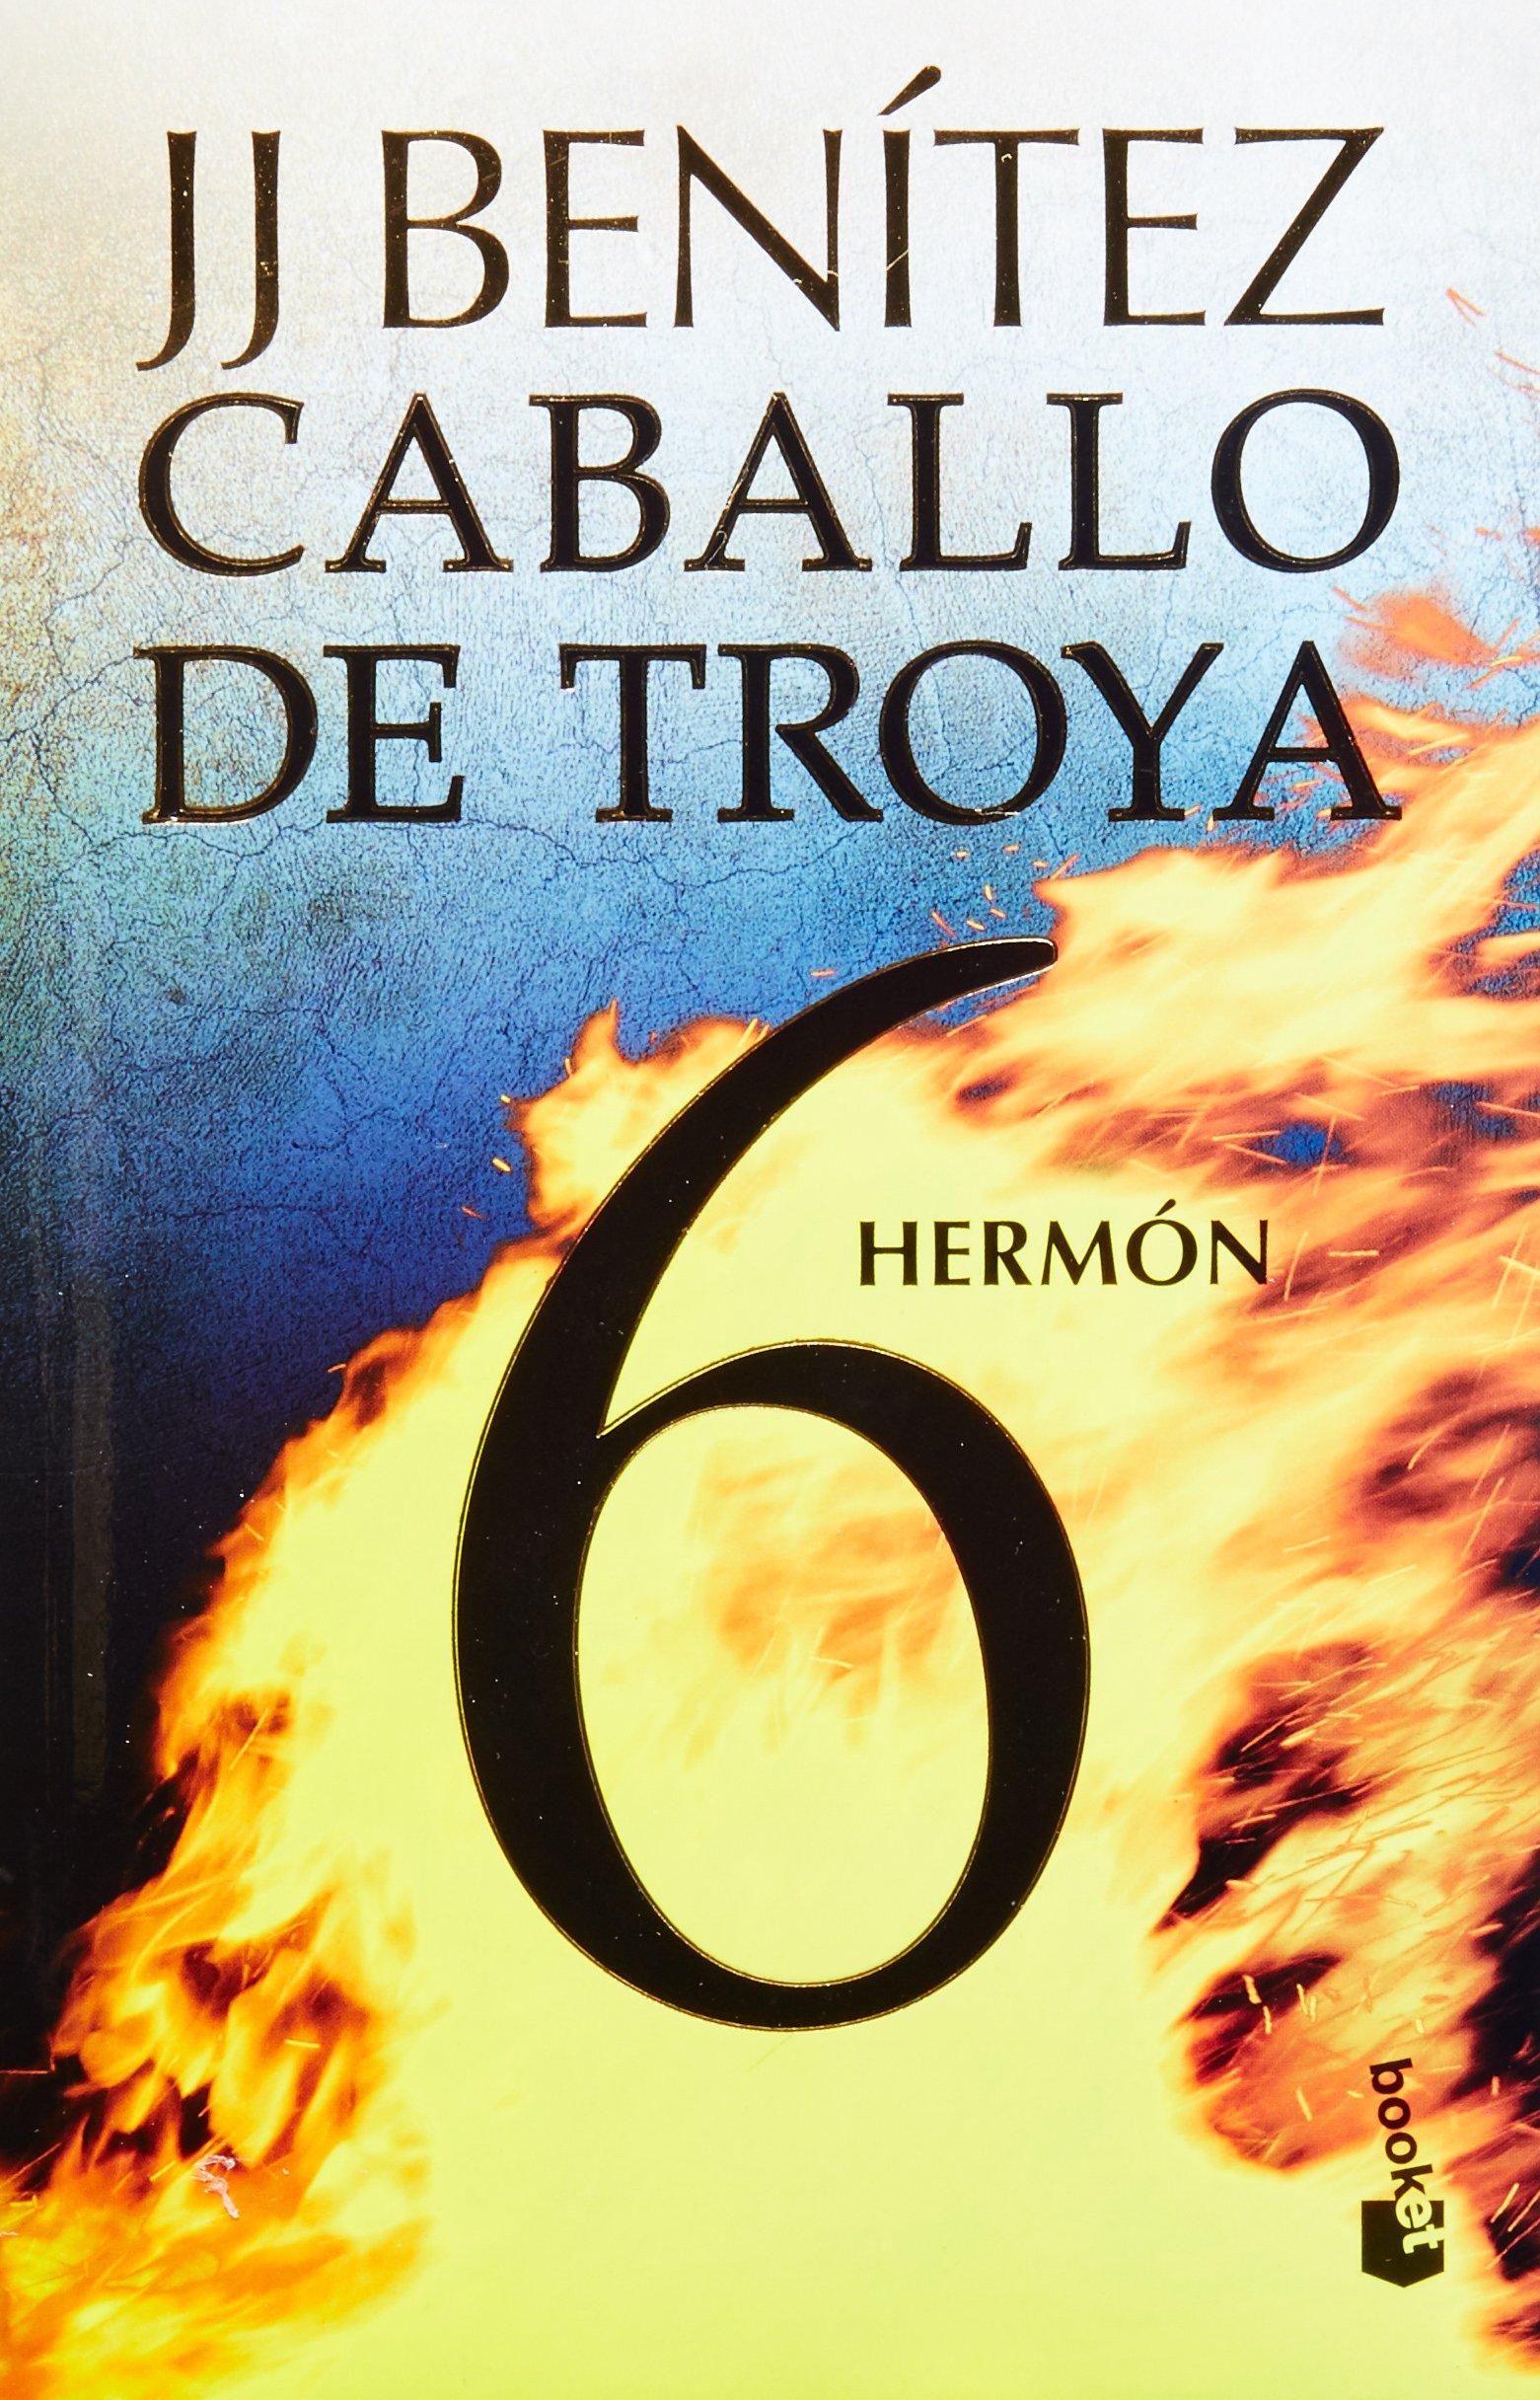 Caballo de Troya 6 (Nueva edic.): 1:J. J. Benítez: Amazon.com.mx: Libros